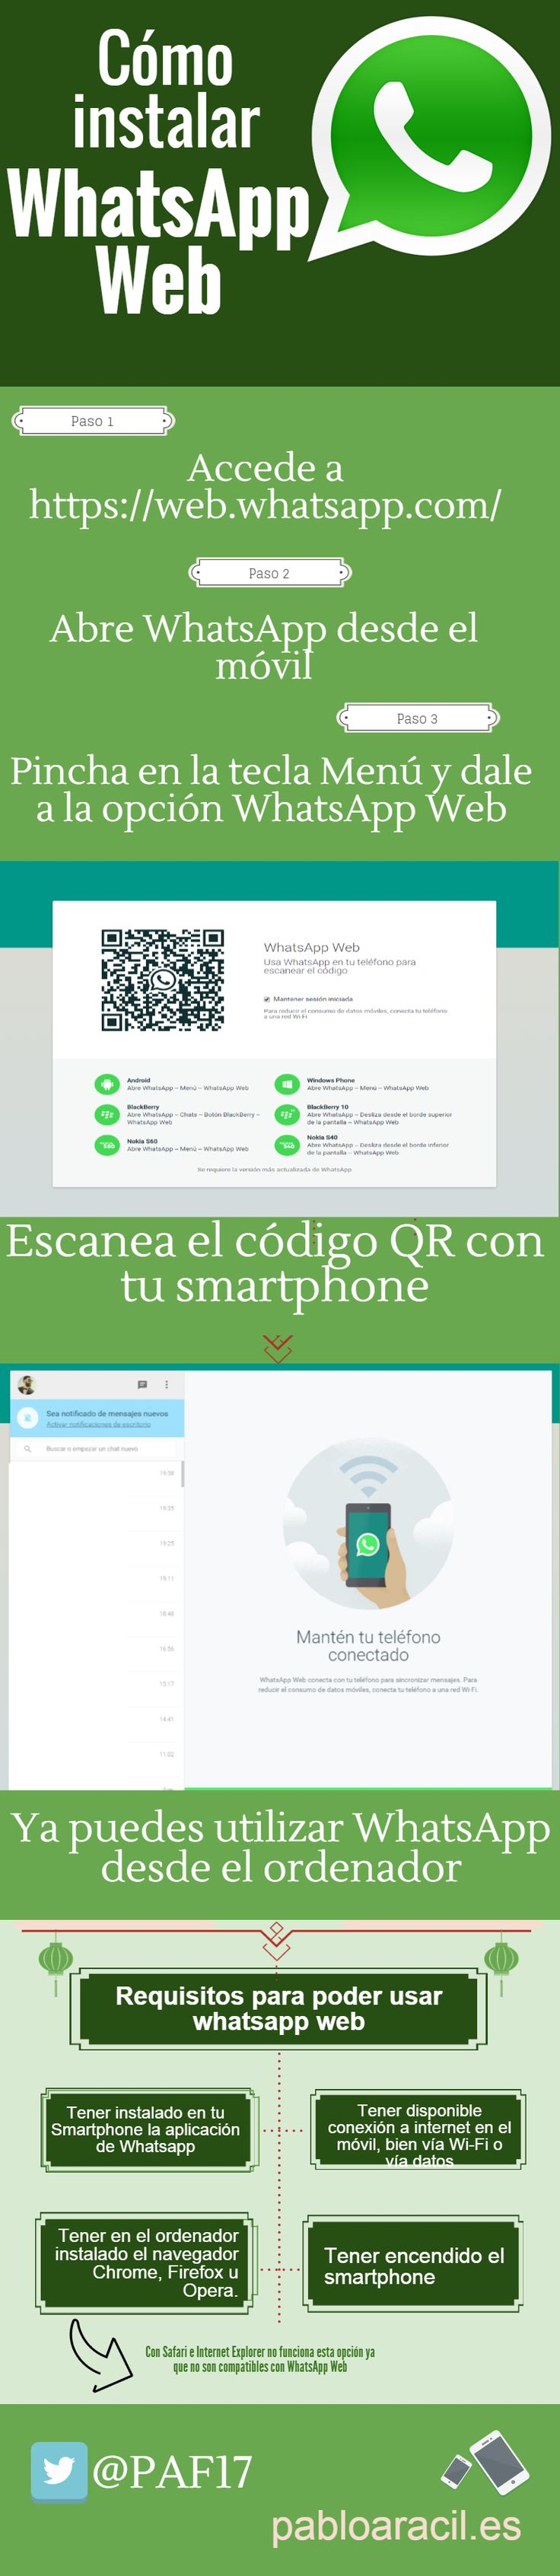 Cómo instalar #WhatsApp #Web #infografia